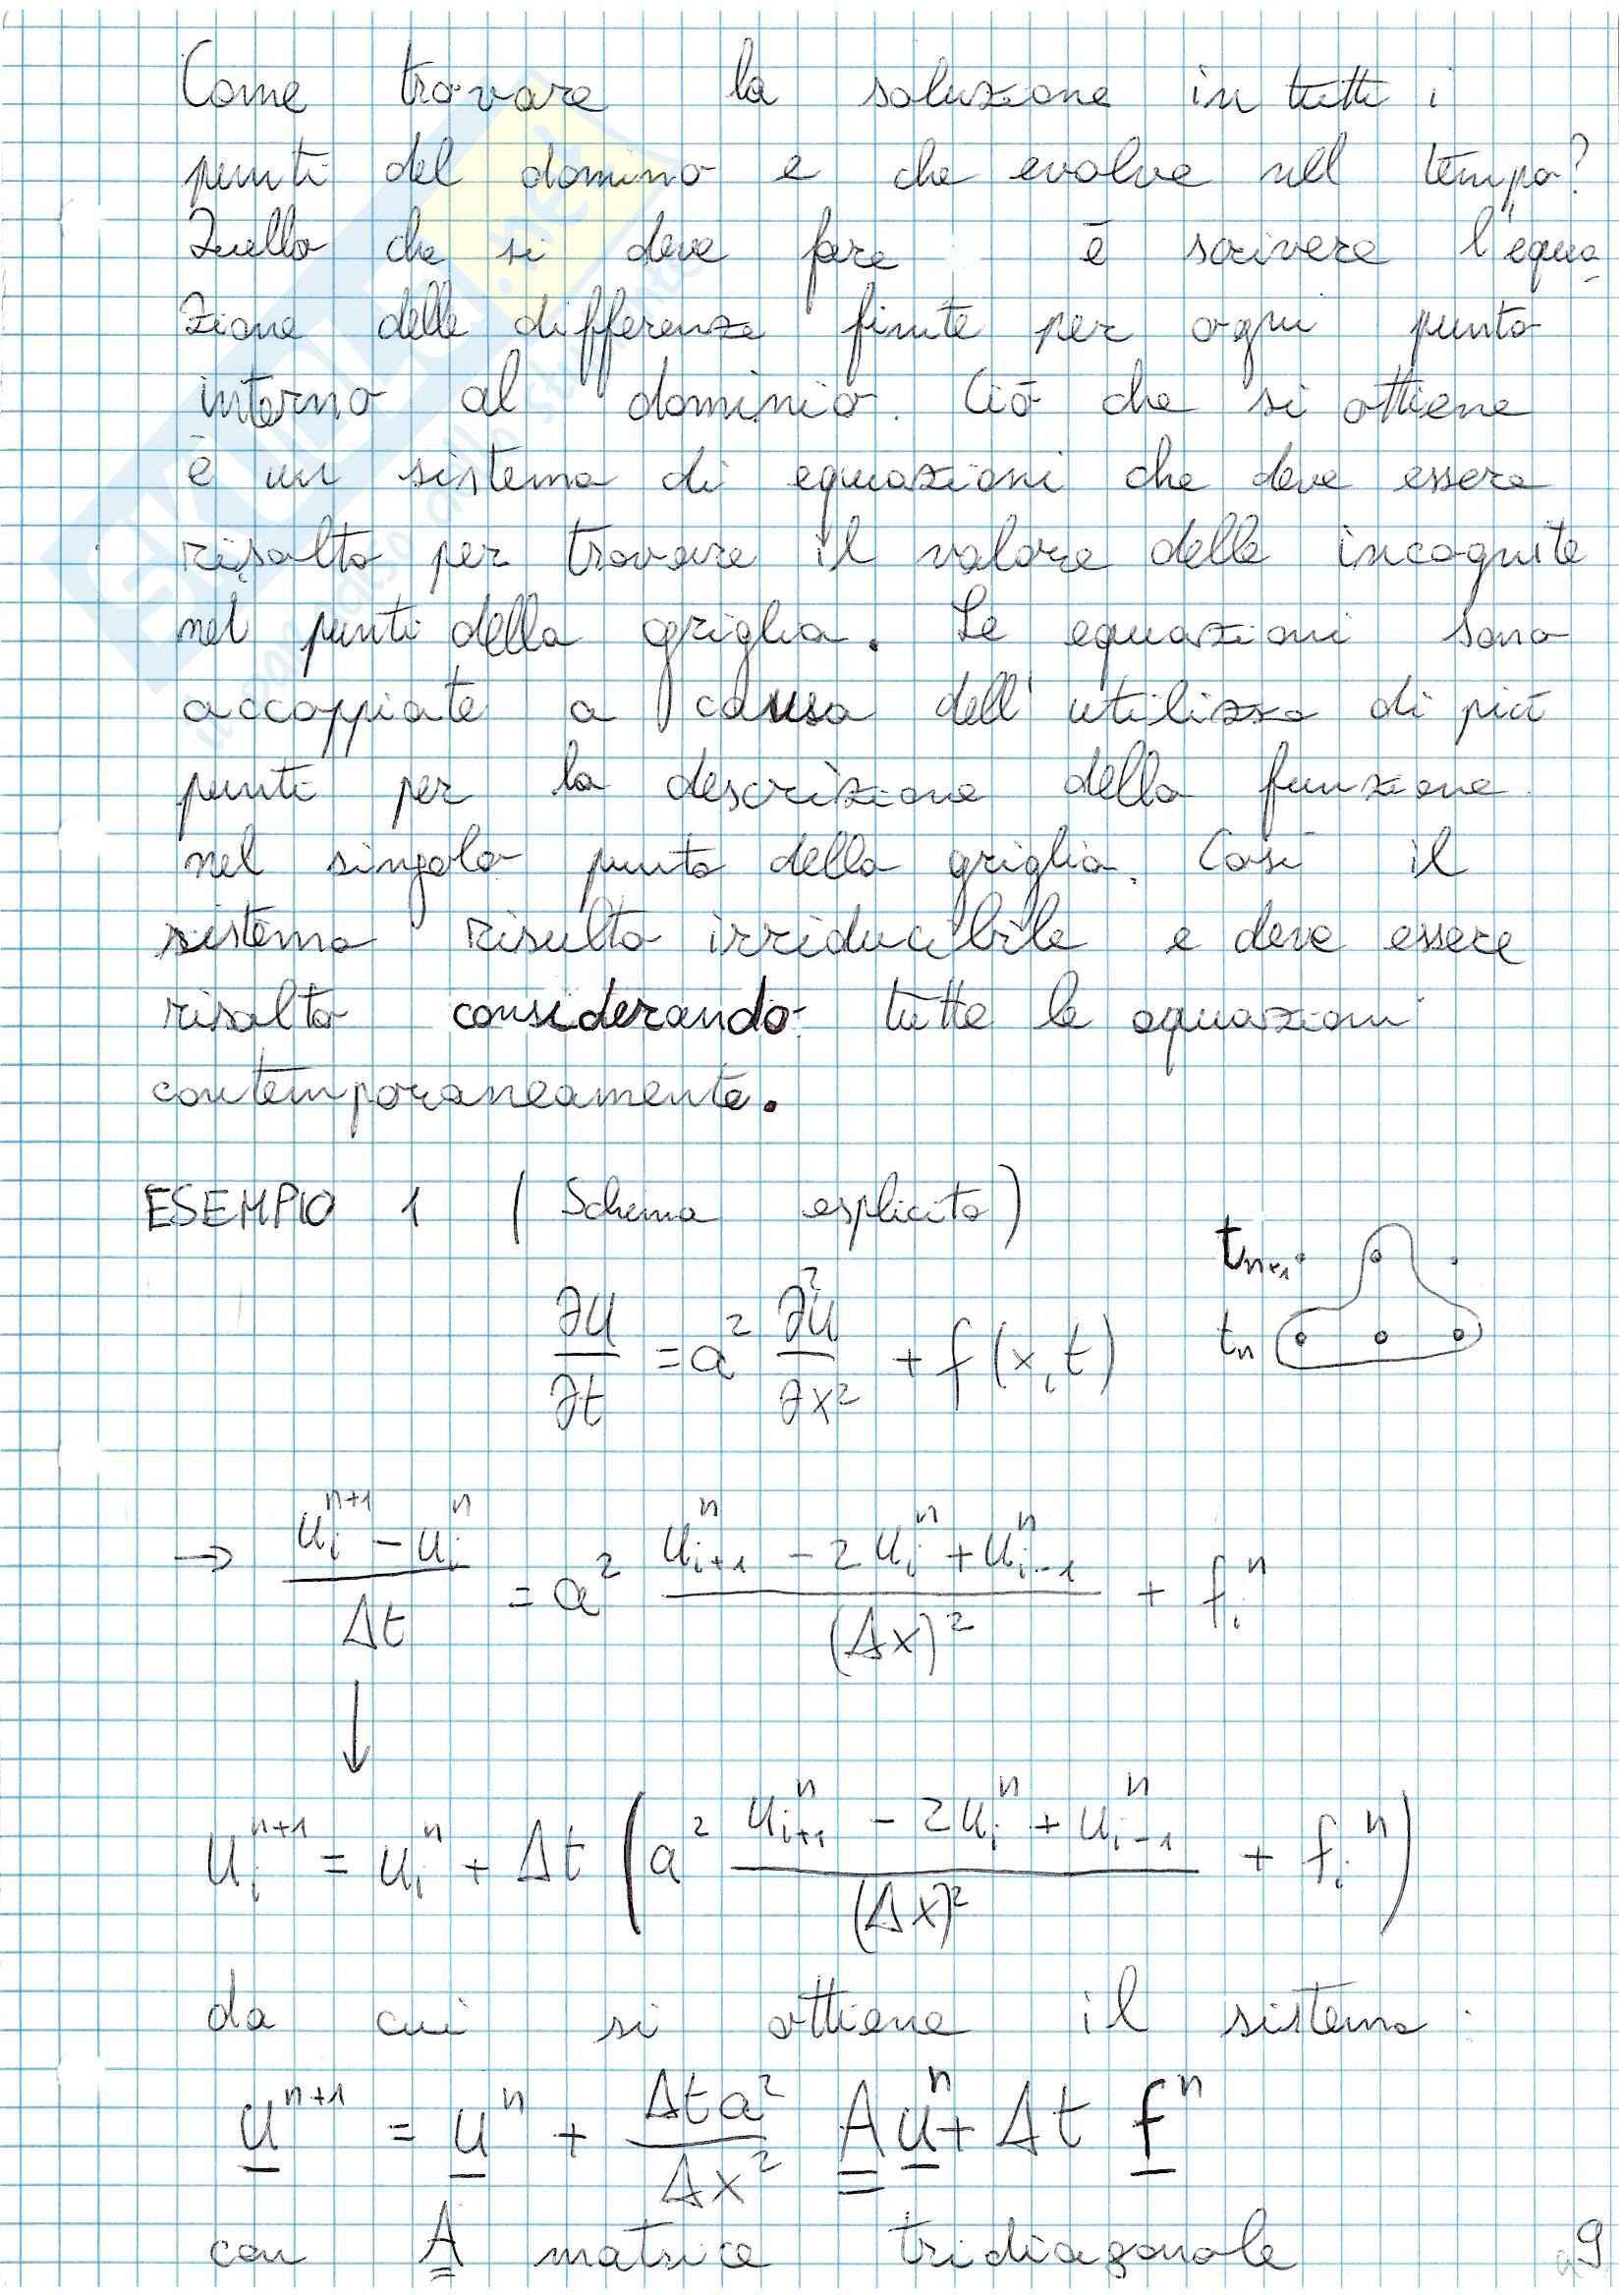 Appunti Fluidodinamica computazionale Pag. 21